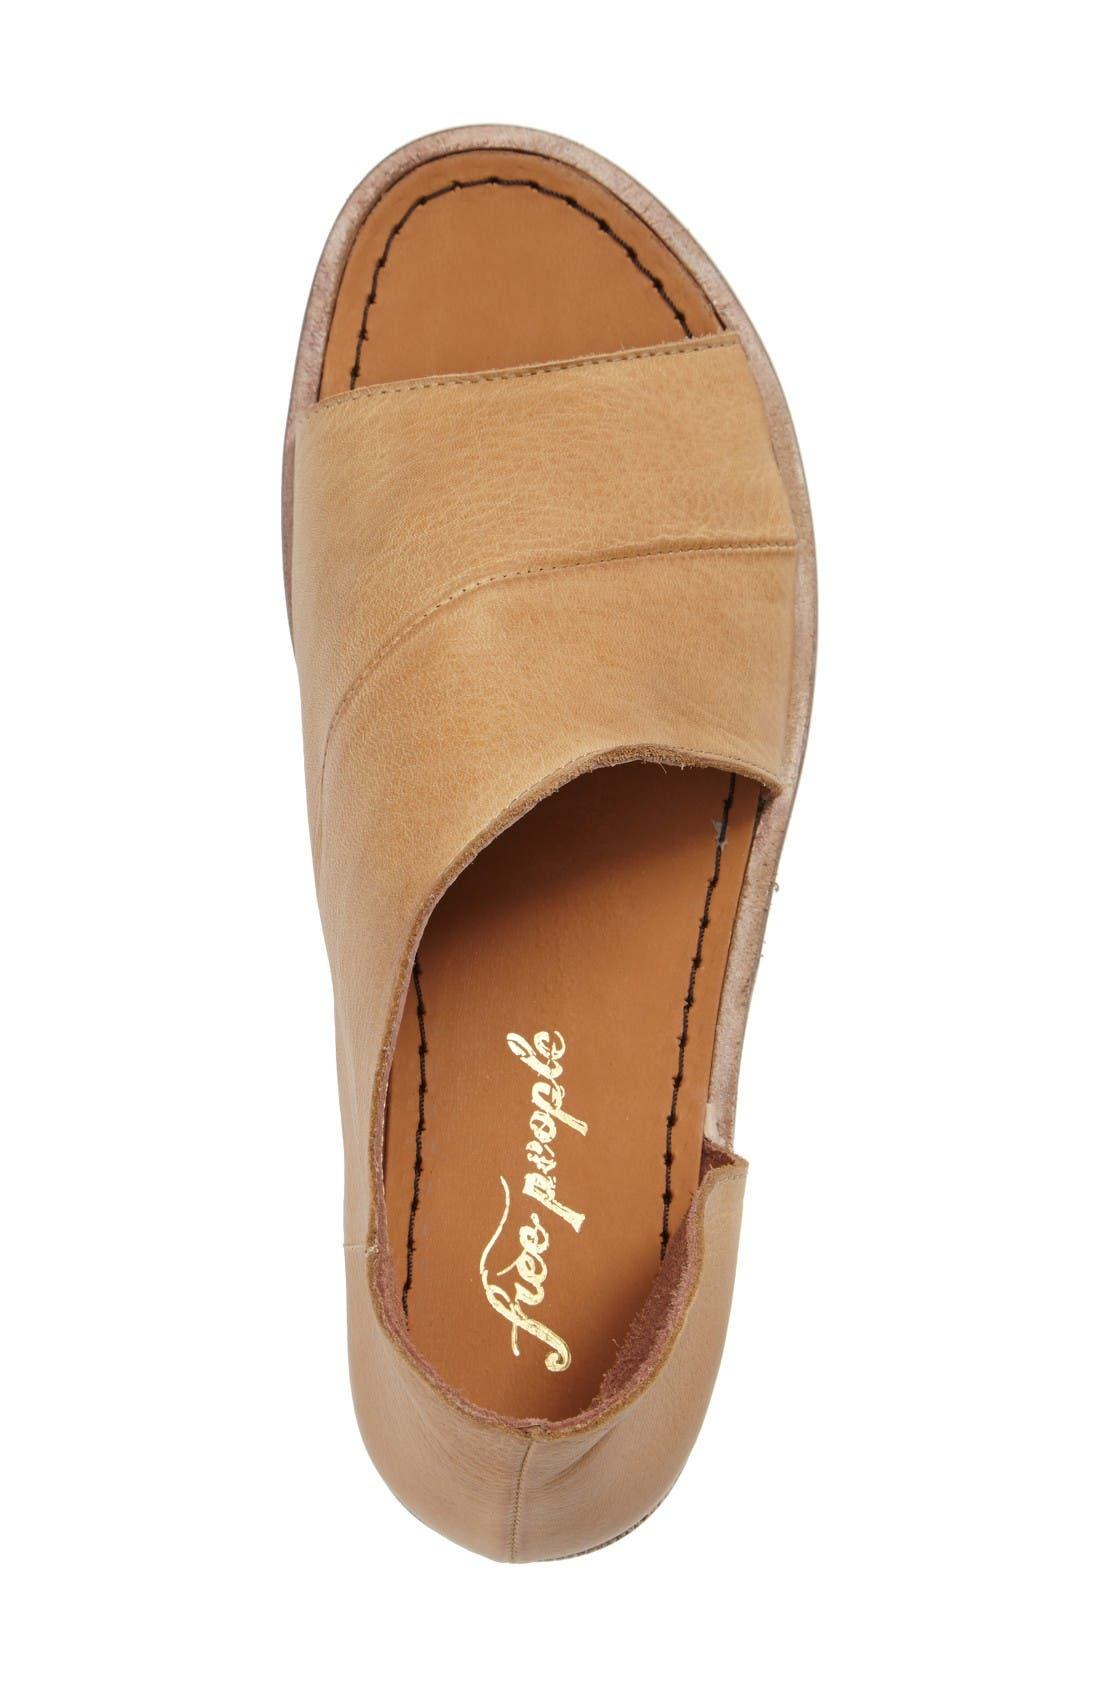 'Mont Blanc' Asymmetrical Sandal,                             Alternate thumbnail 3, color,                             Natural Leather